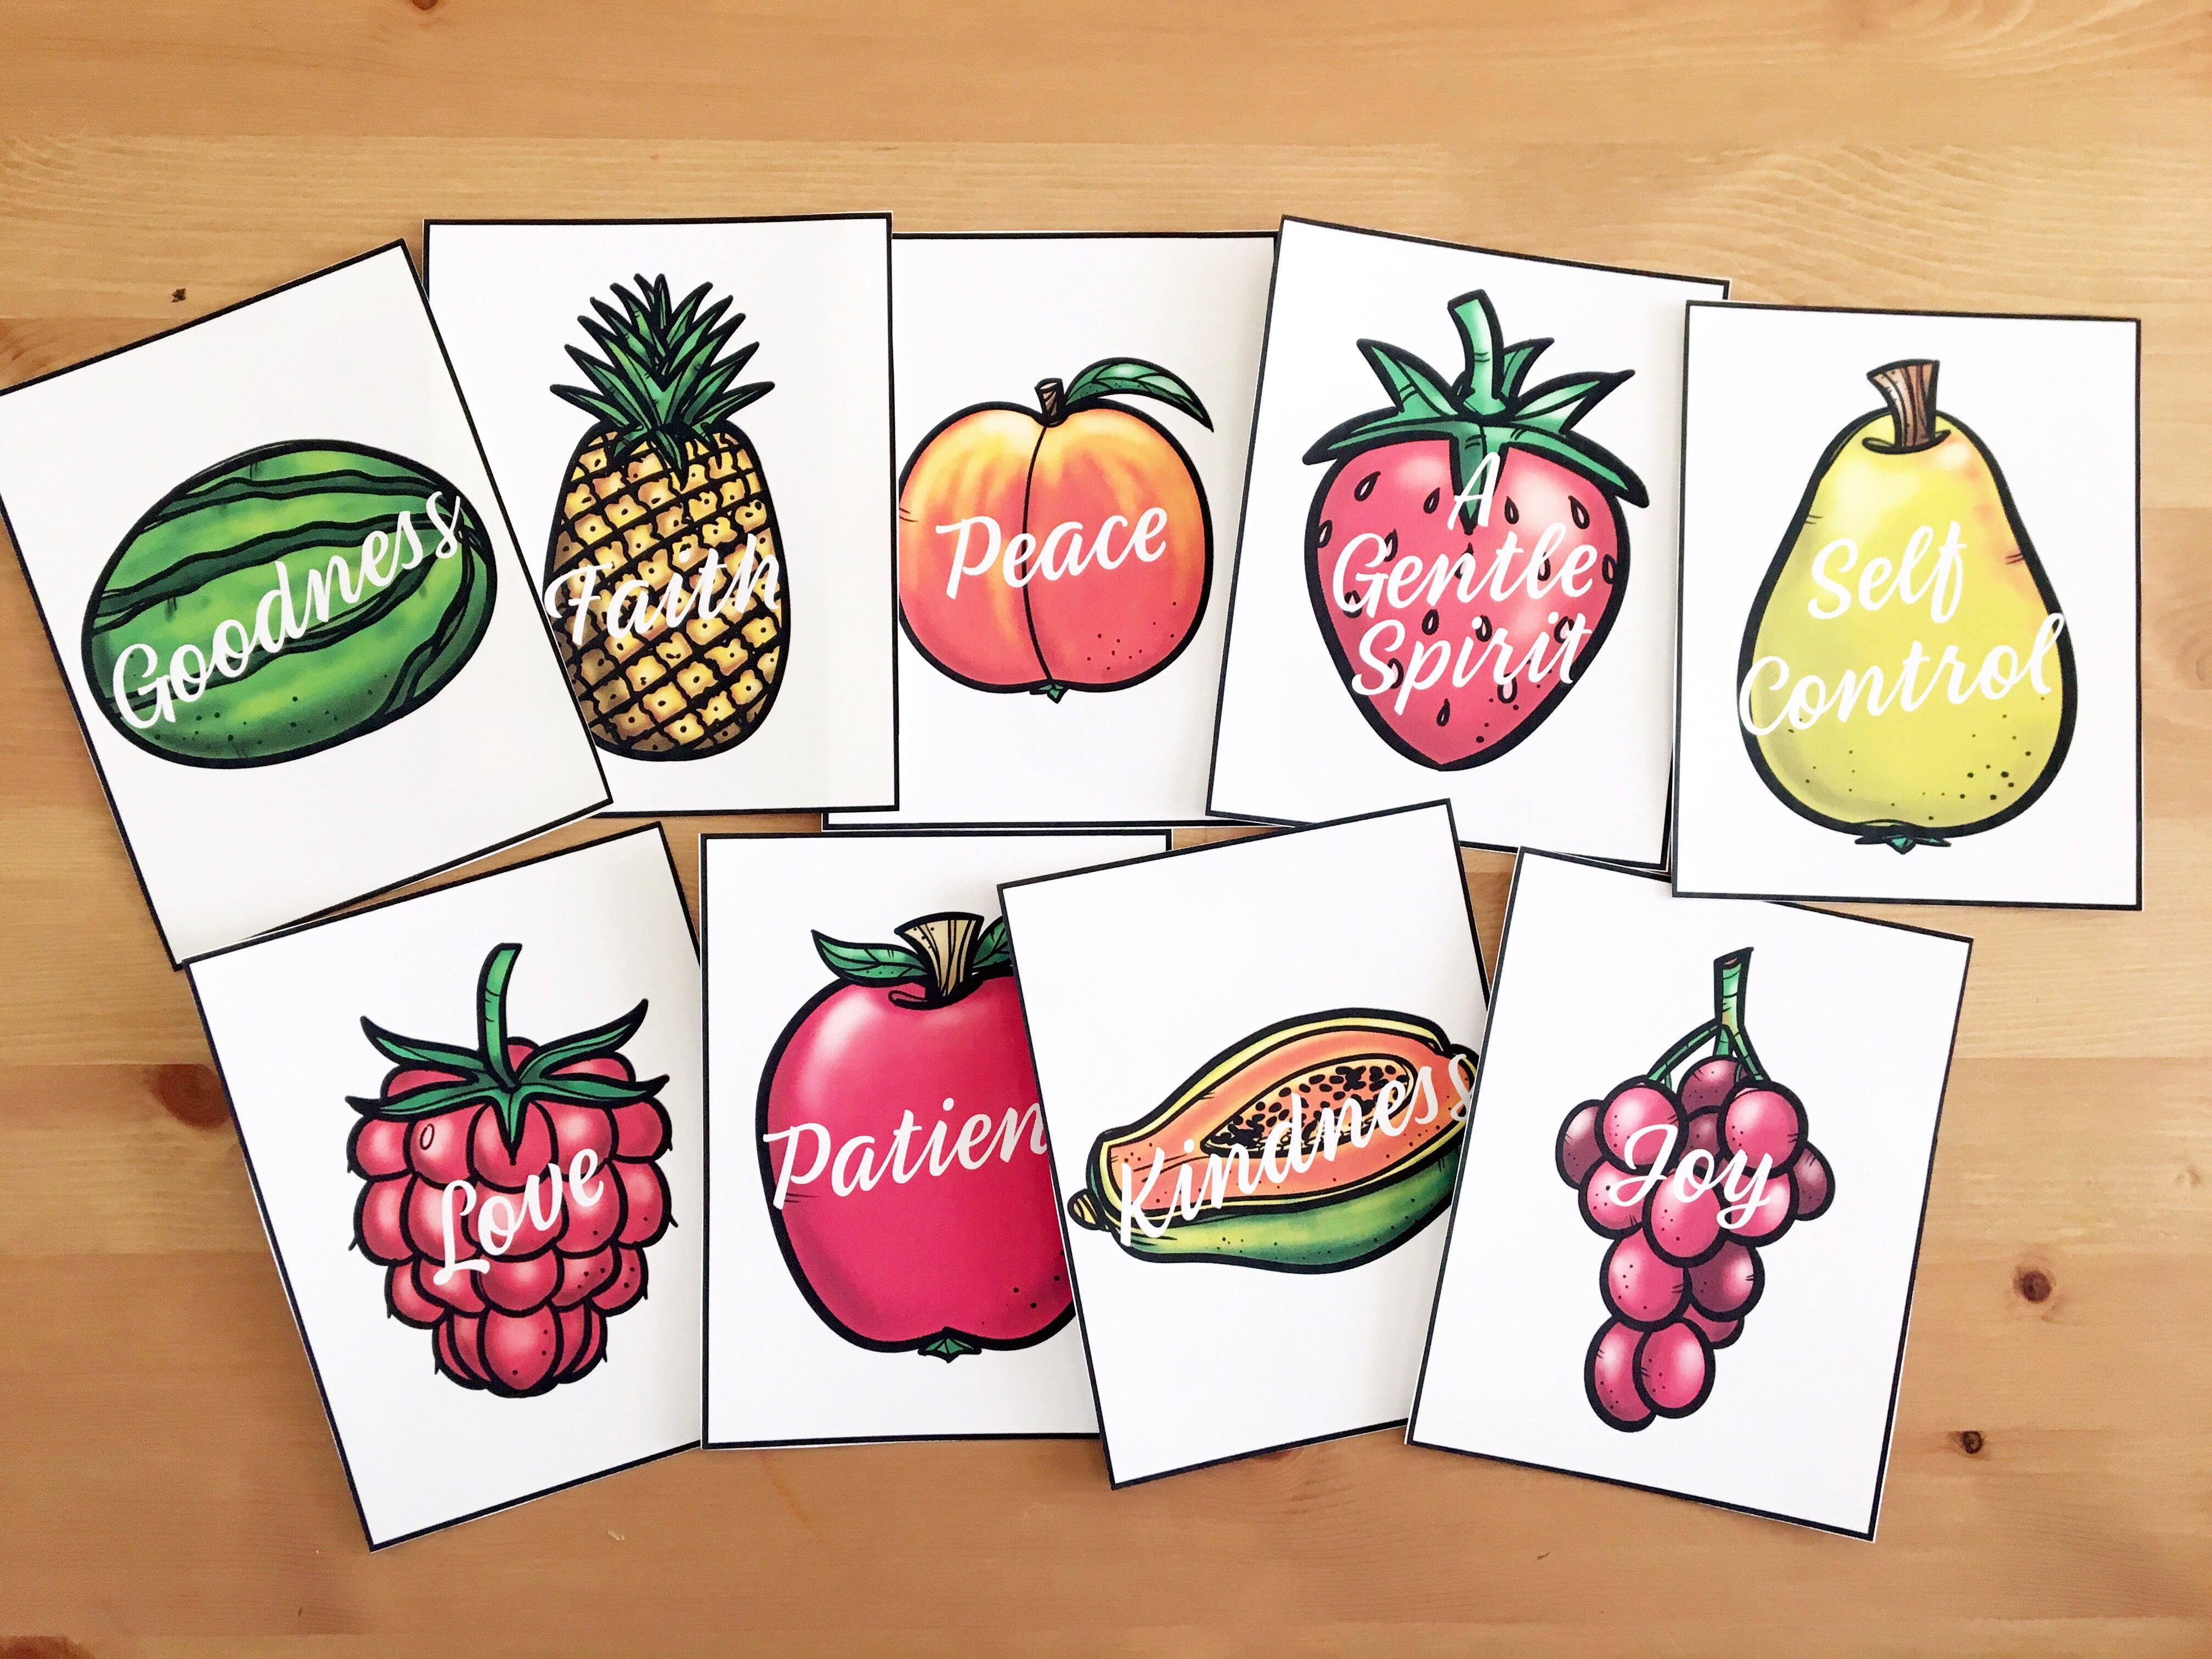 Fruits Of The Spirit Cards Fruit Of The Spirit Fruit Design Fruit Logo